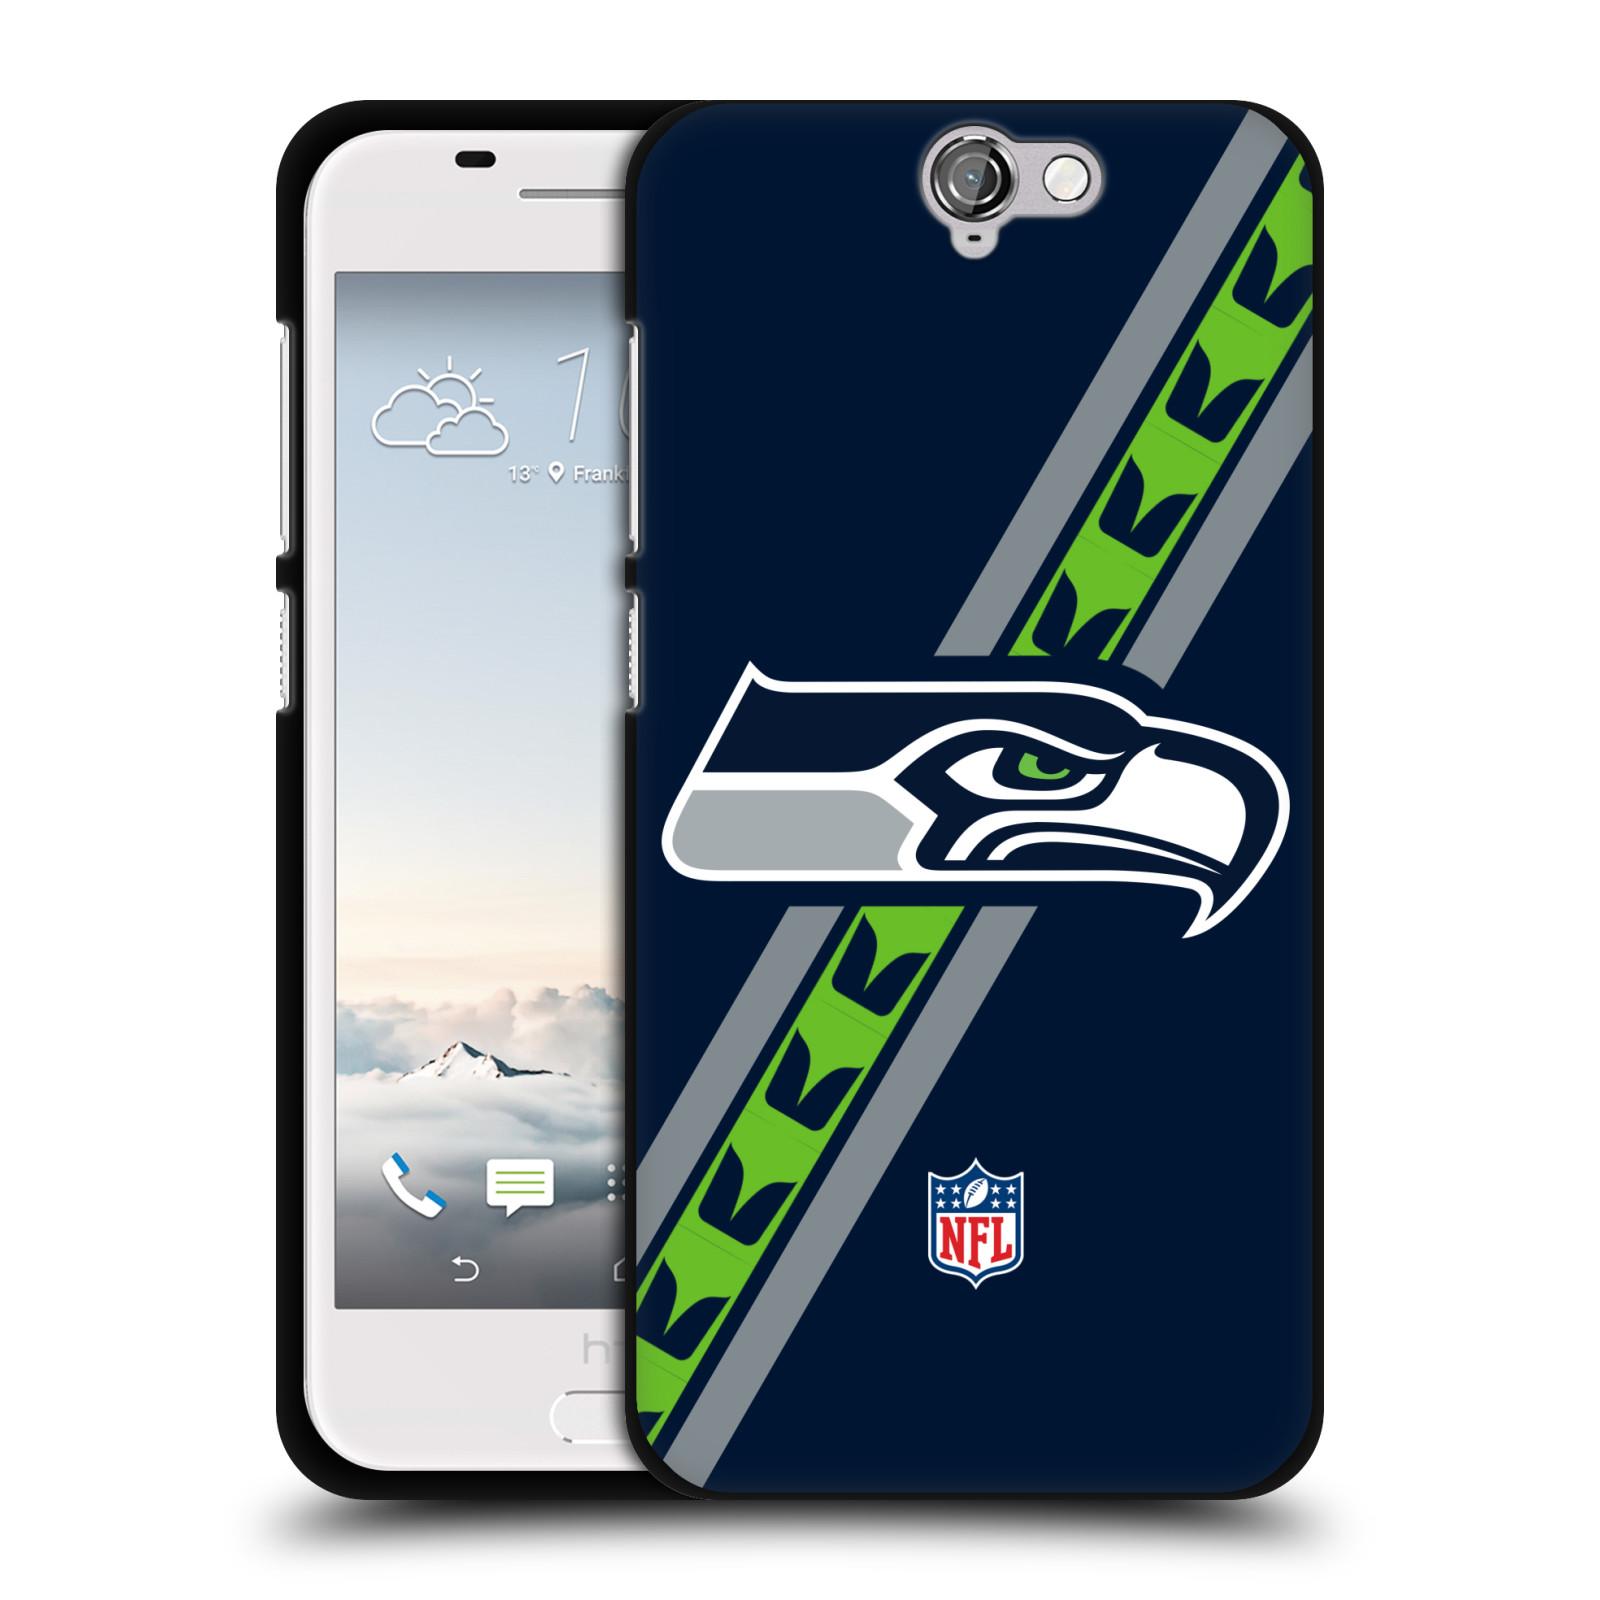 OFFICIAL-NFL-SEATTLE-SEAHAWKS-LOGO-BLACK-SOFT-GEL-CASE-FOR-HTC-PHONES